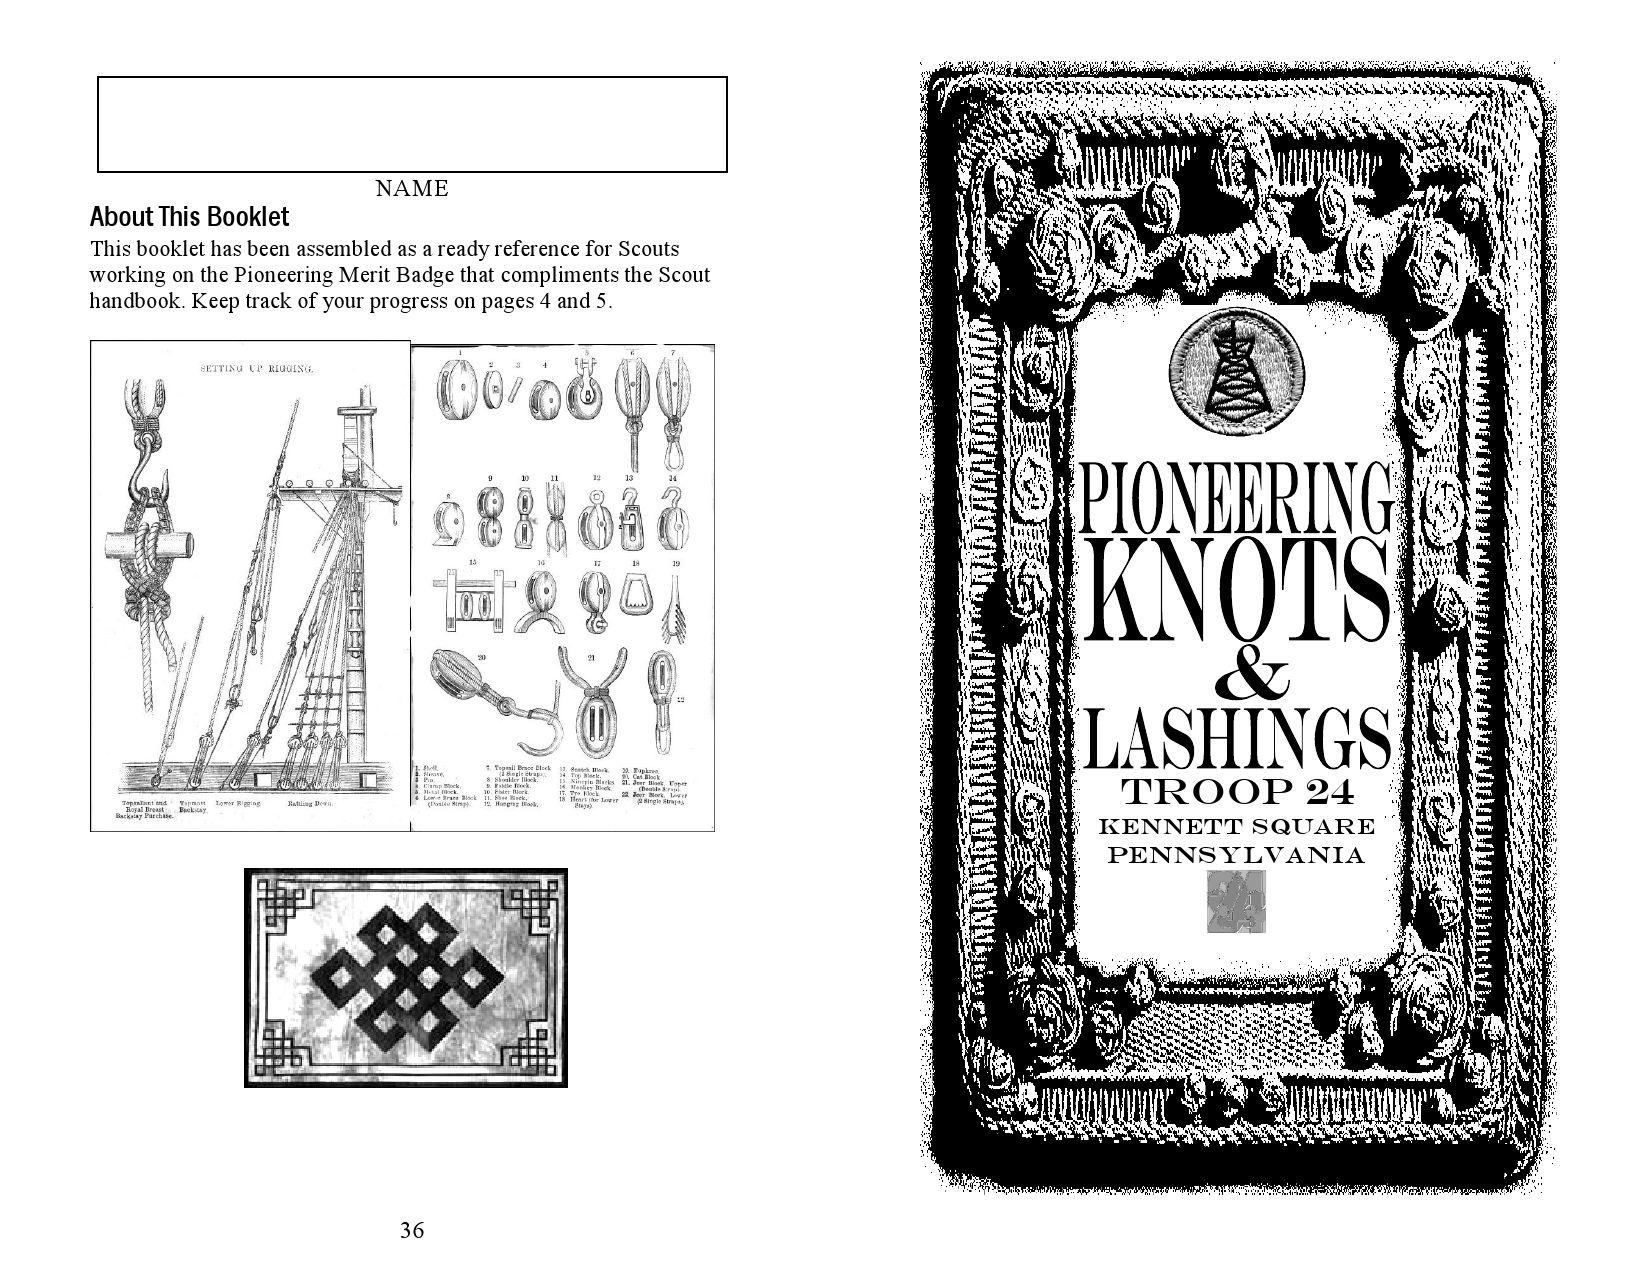 pioneeringbook by Scout Library Kraal Fuego (WFIS-Spain